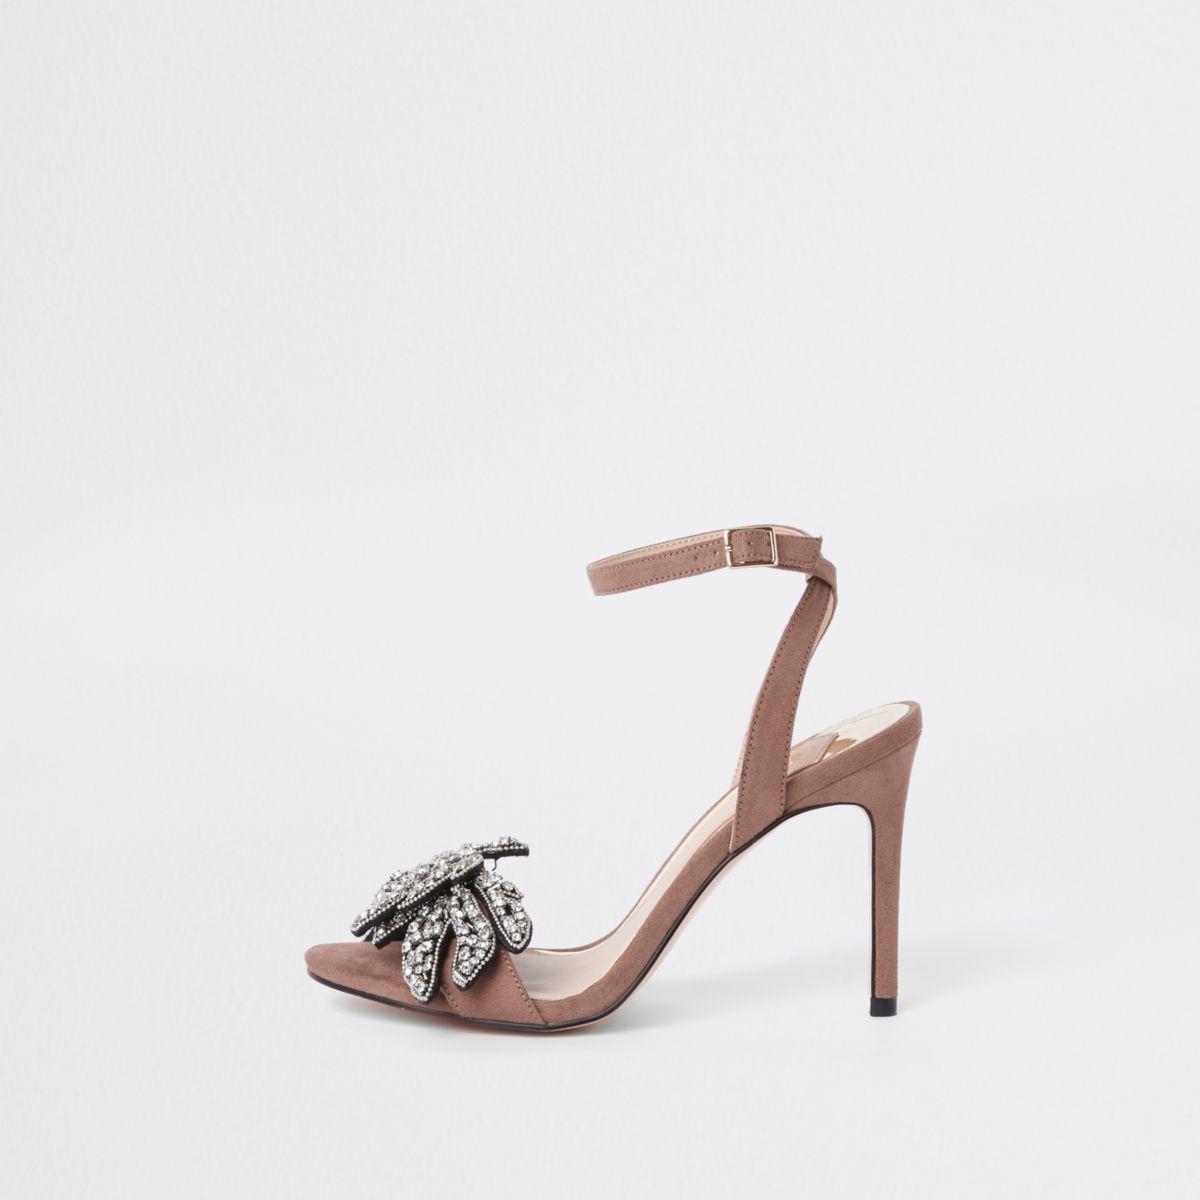 Pink rhinestone embellished barely there sandal